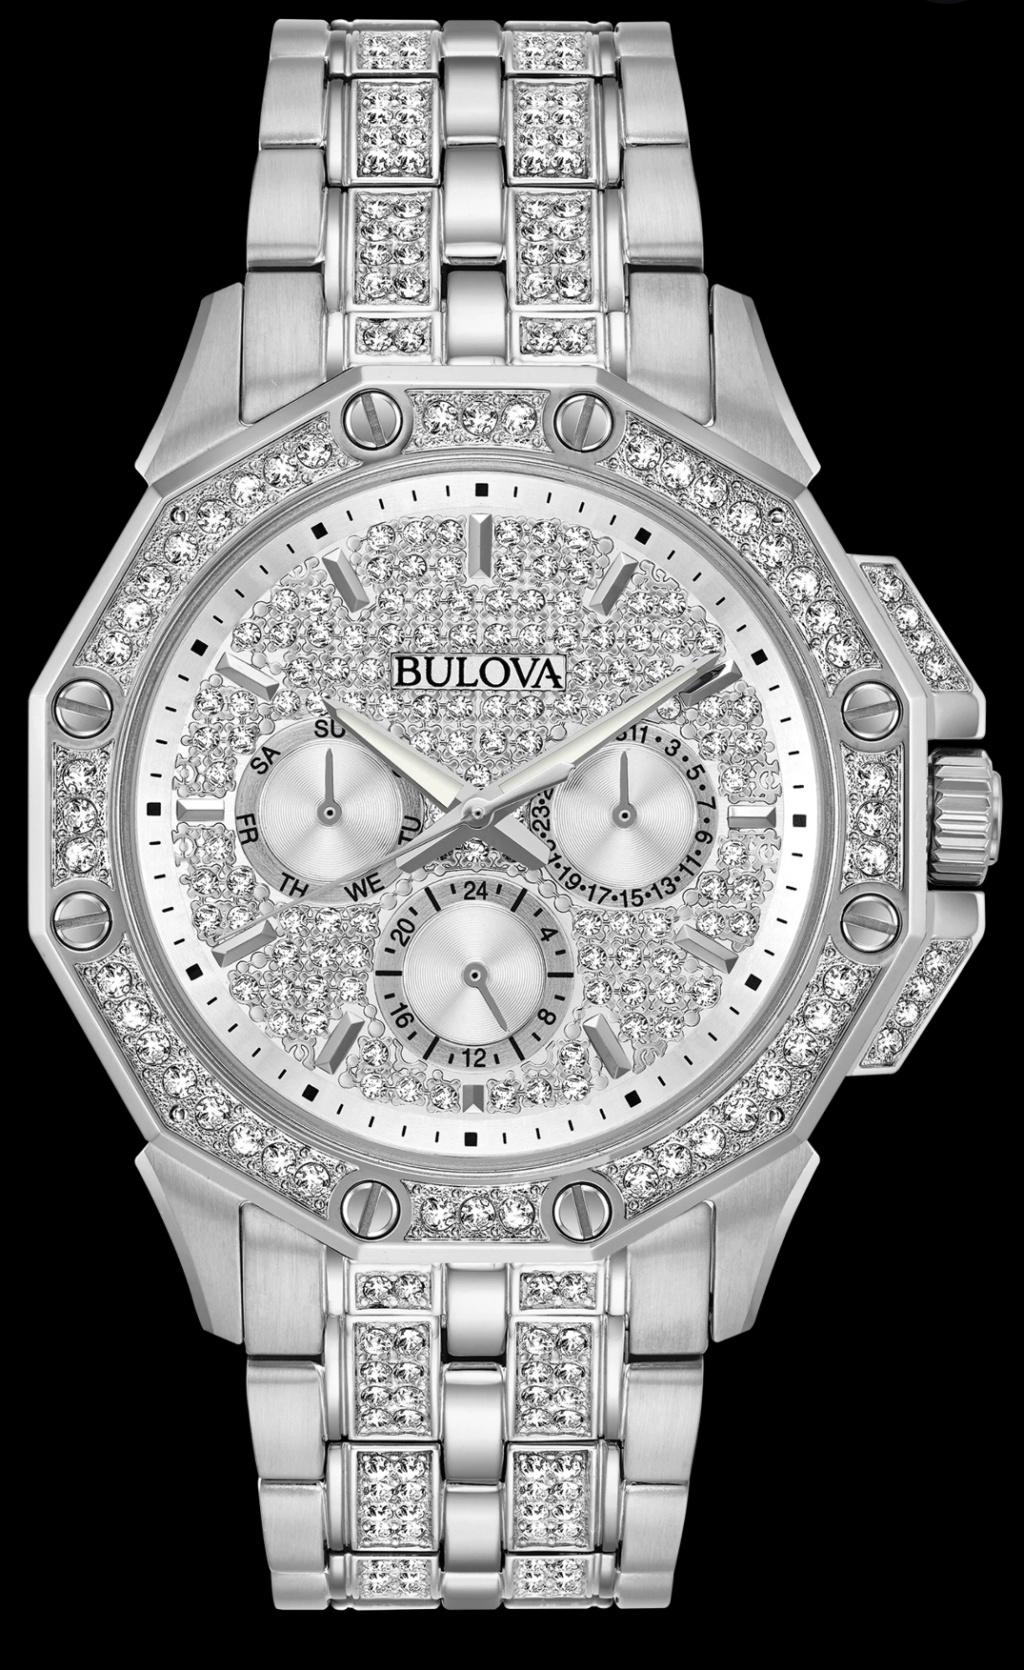 Bulova Lunar Pilot, l'autre moonwatch ! - Page 2 Screen10